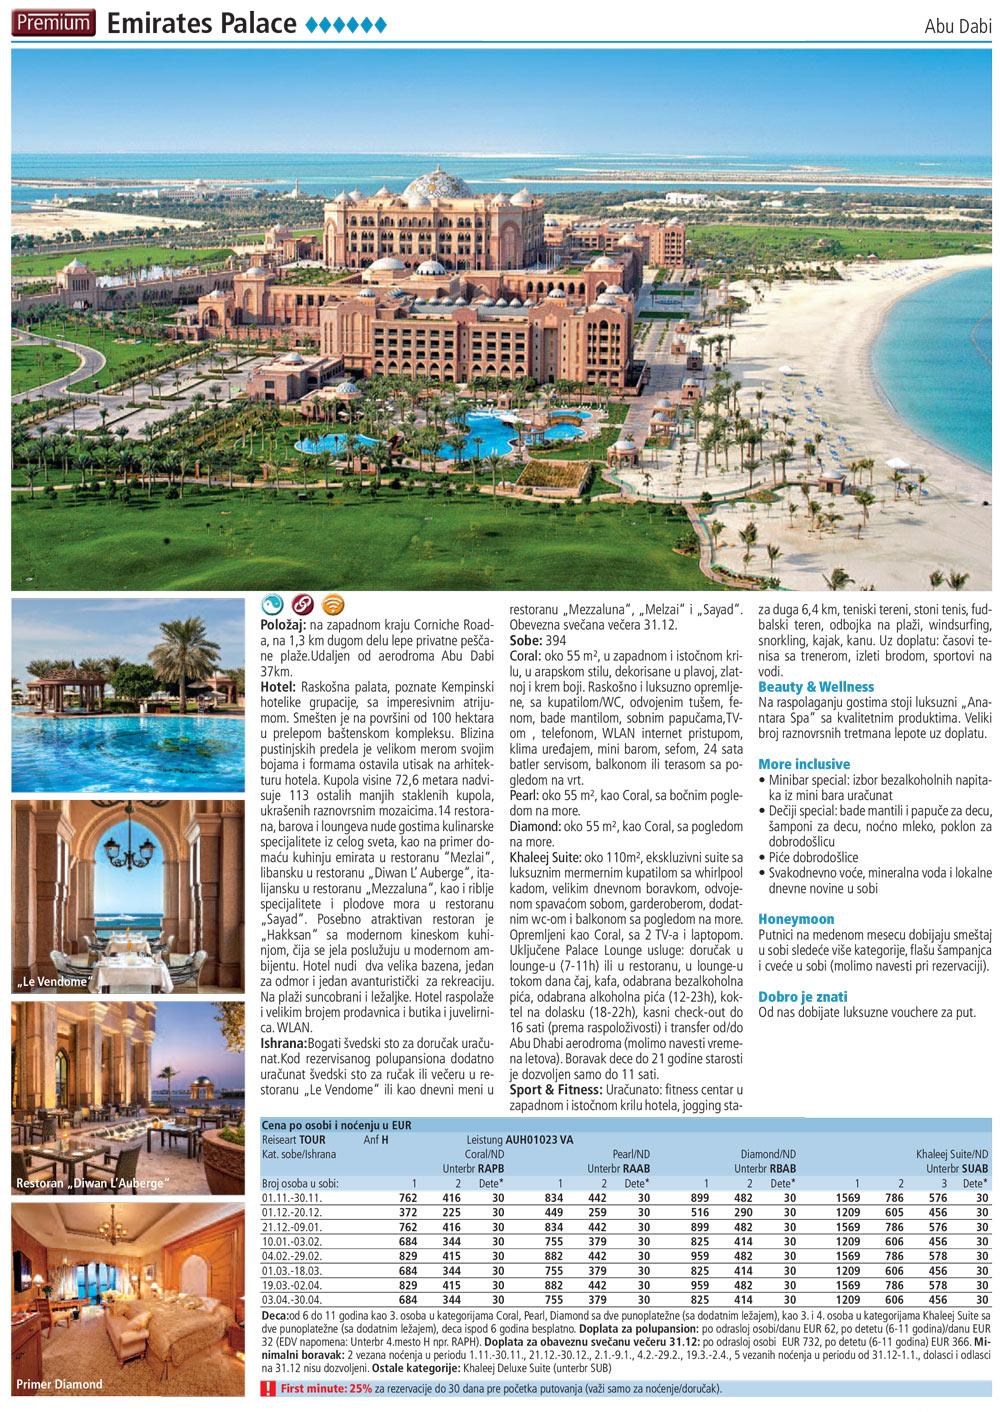 abu-dabi-emirates-palace